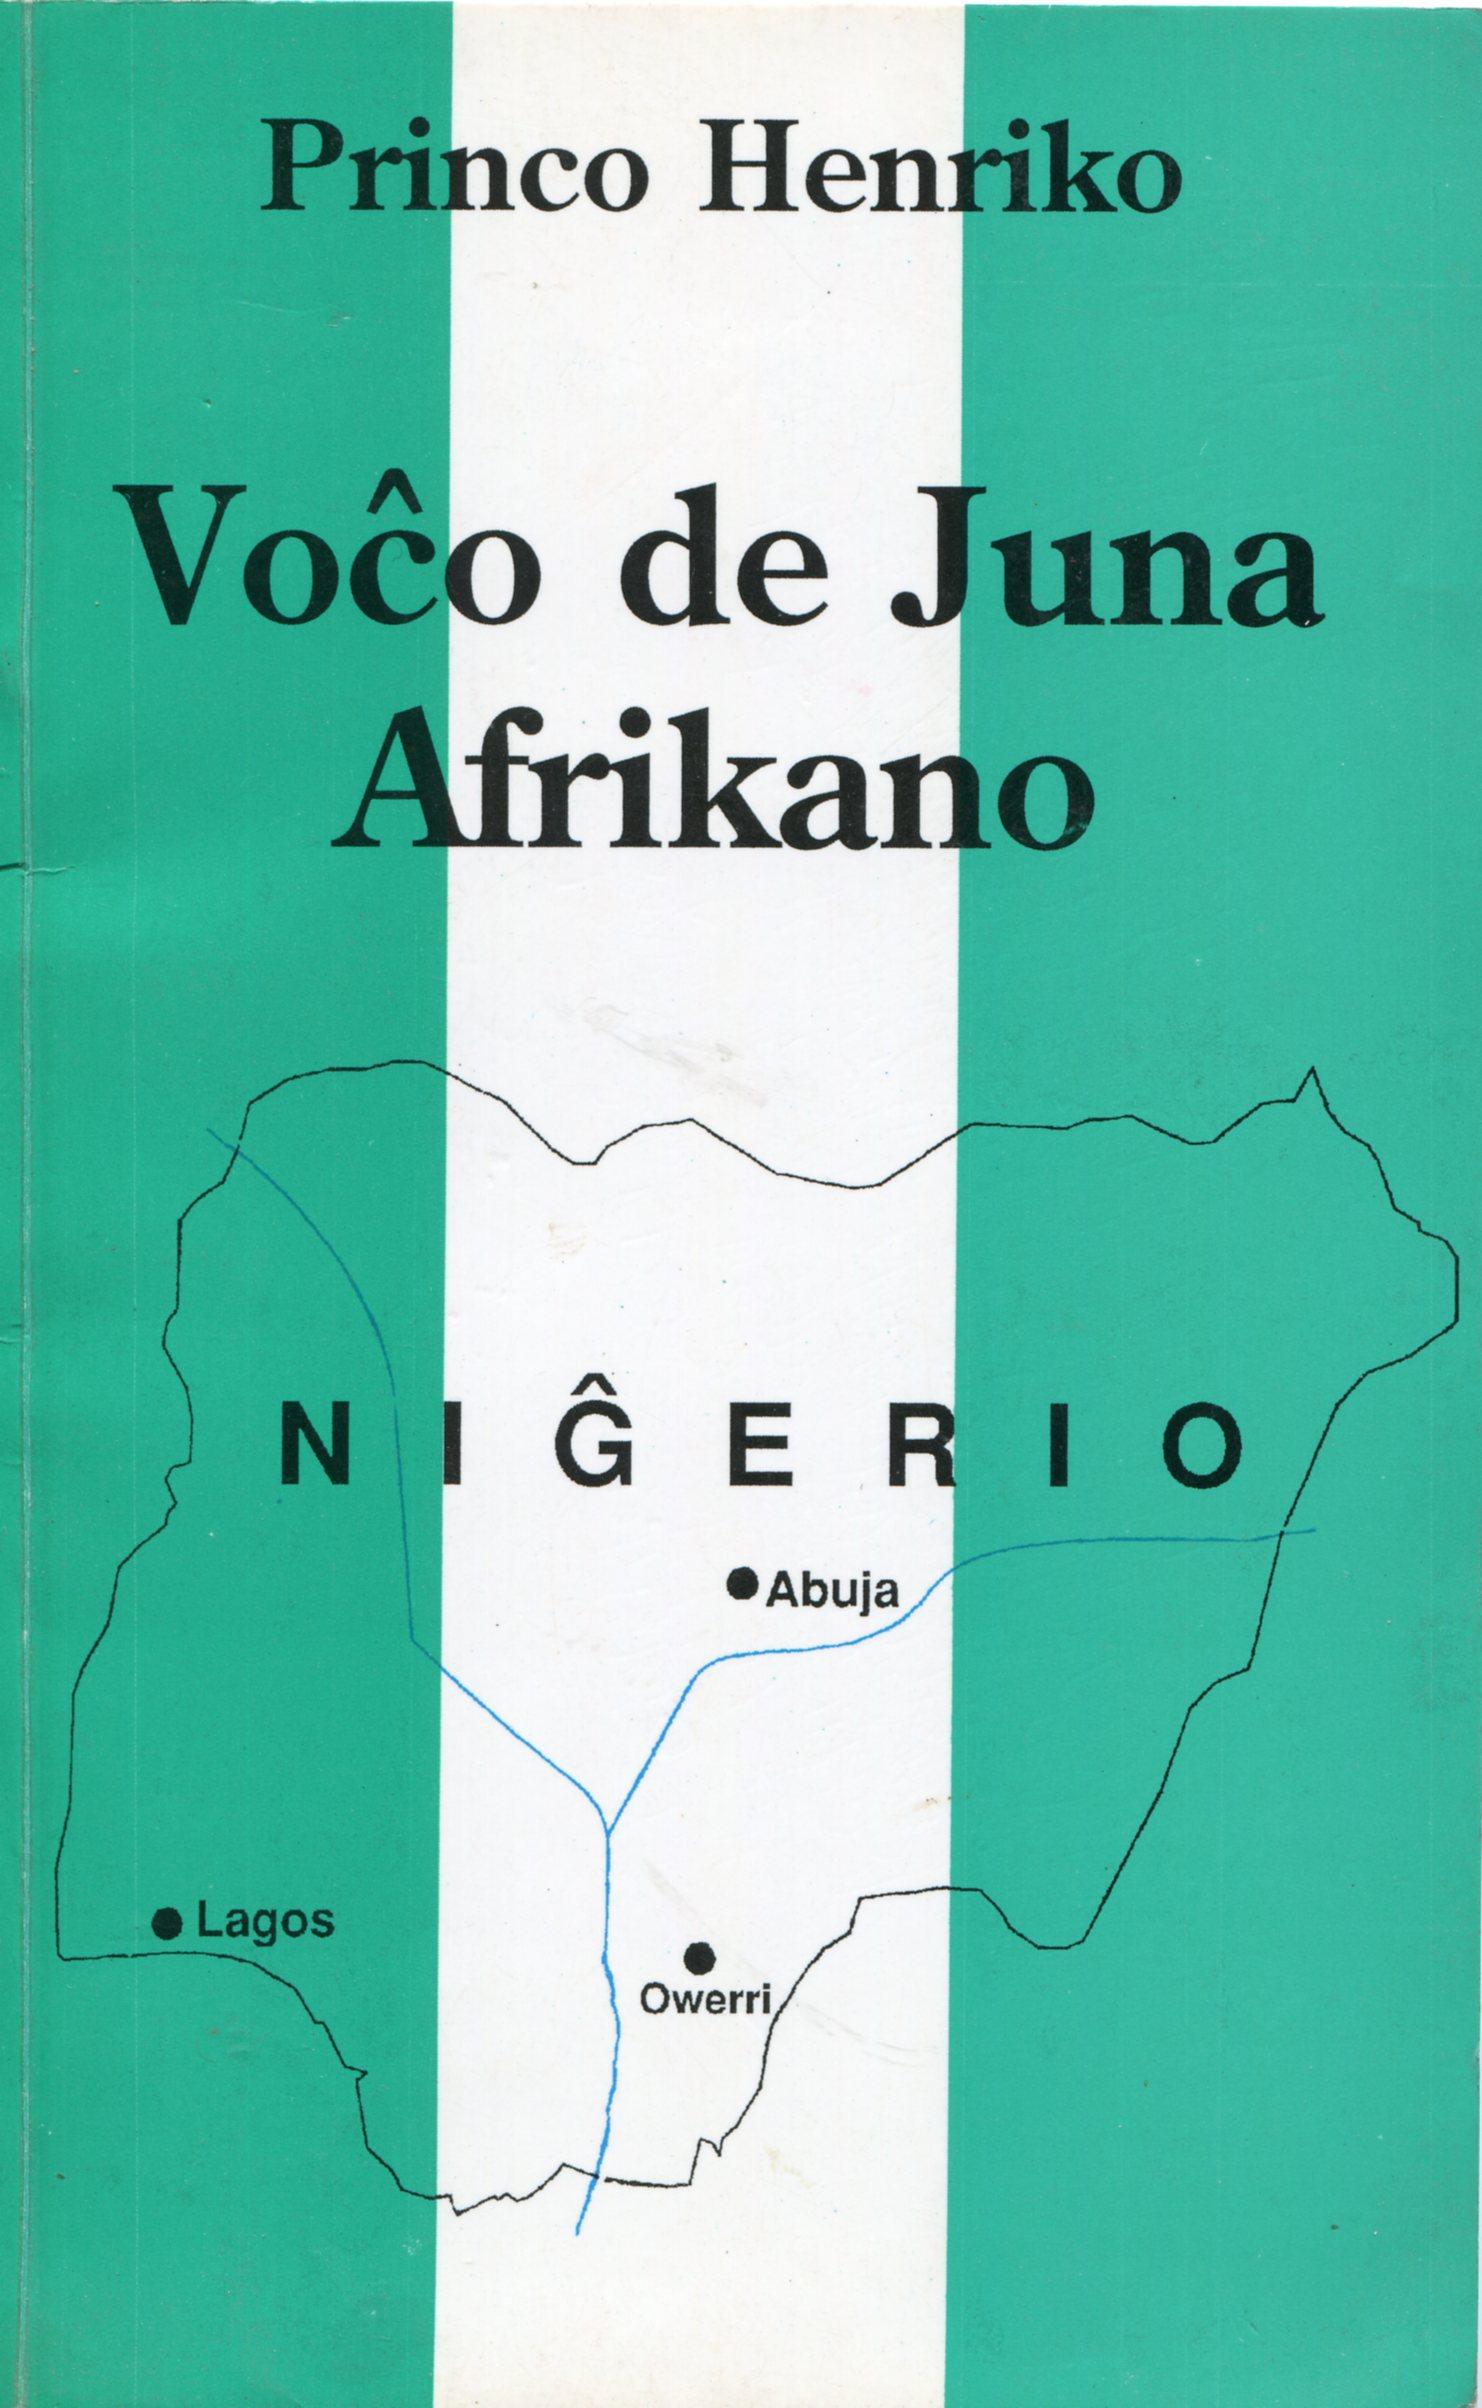 Voĉo de juna afrikano